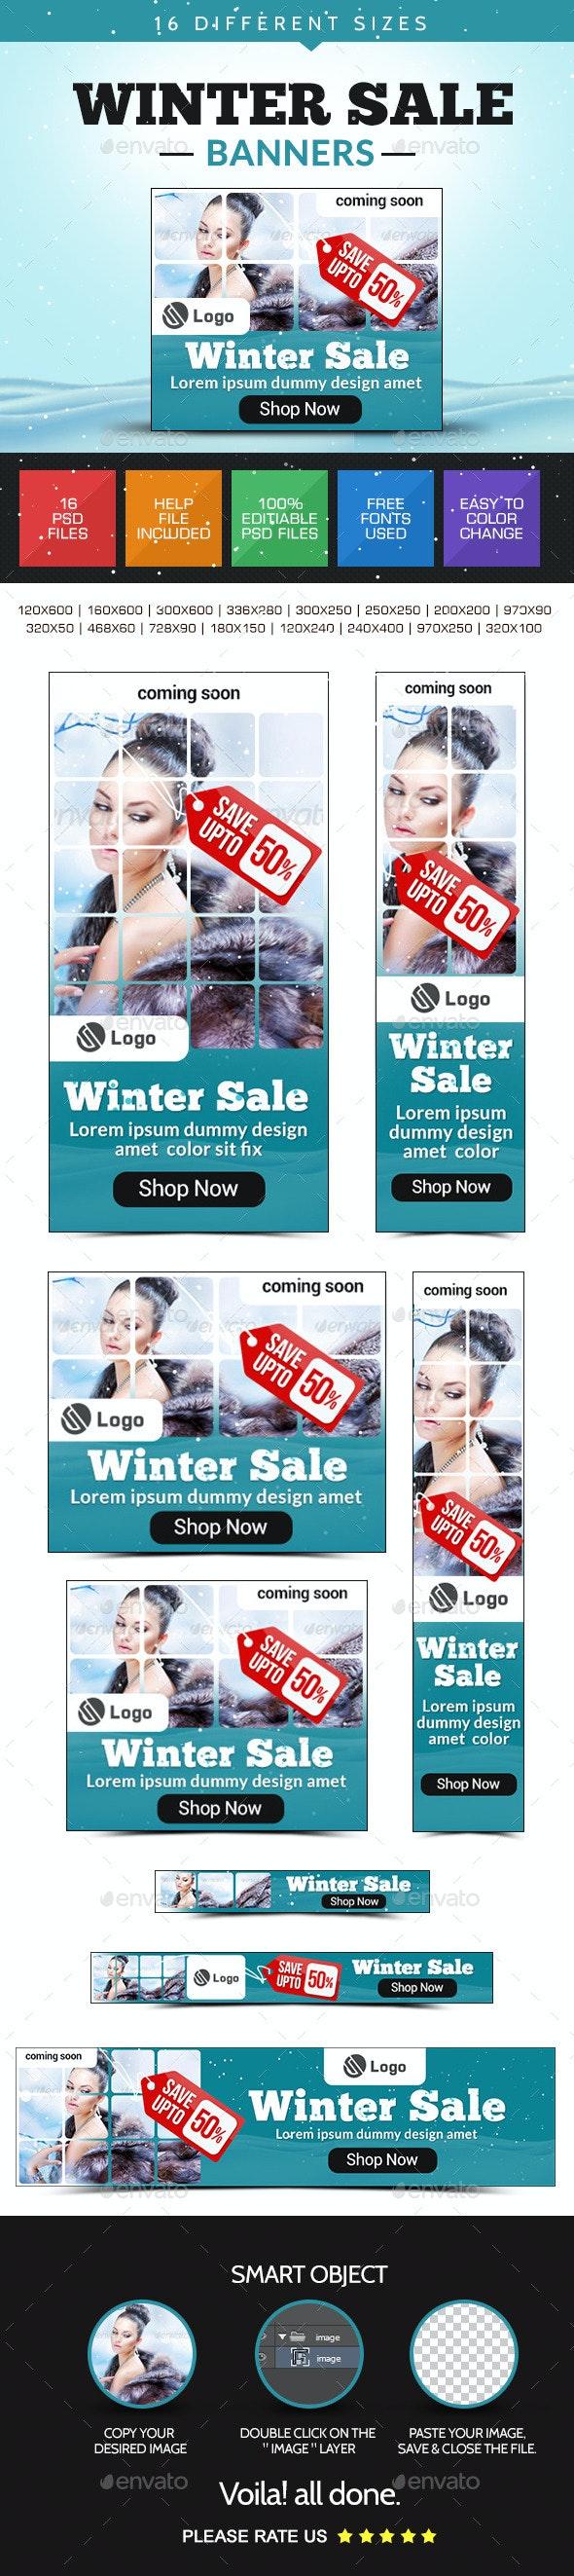 Winter Sale Banner Design Set - Banners & Ads Web Elements